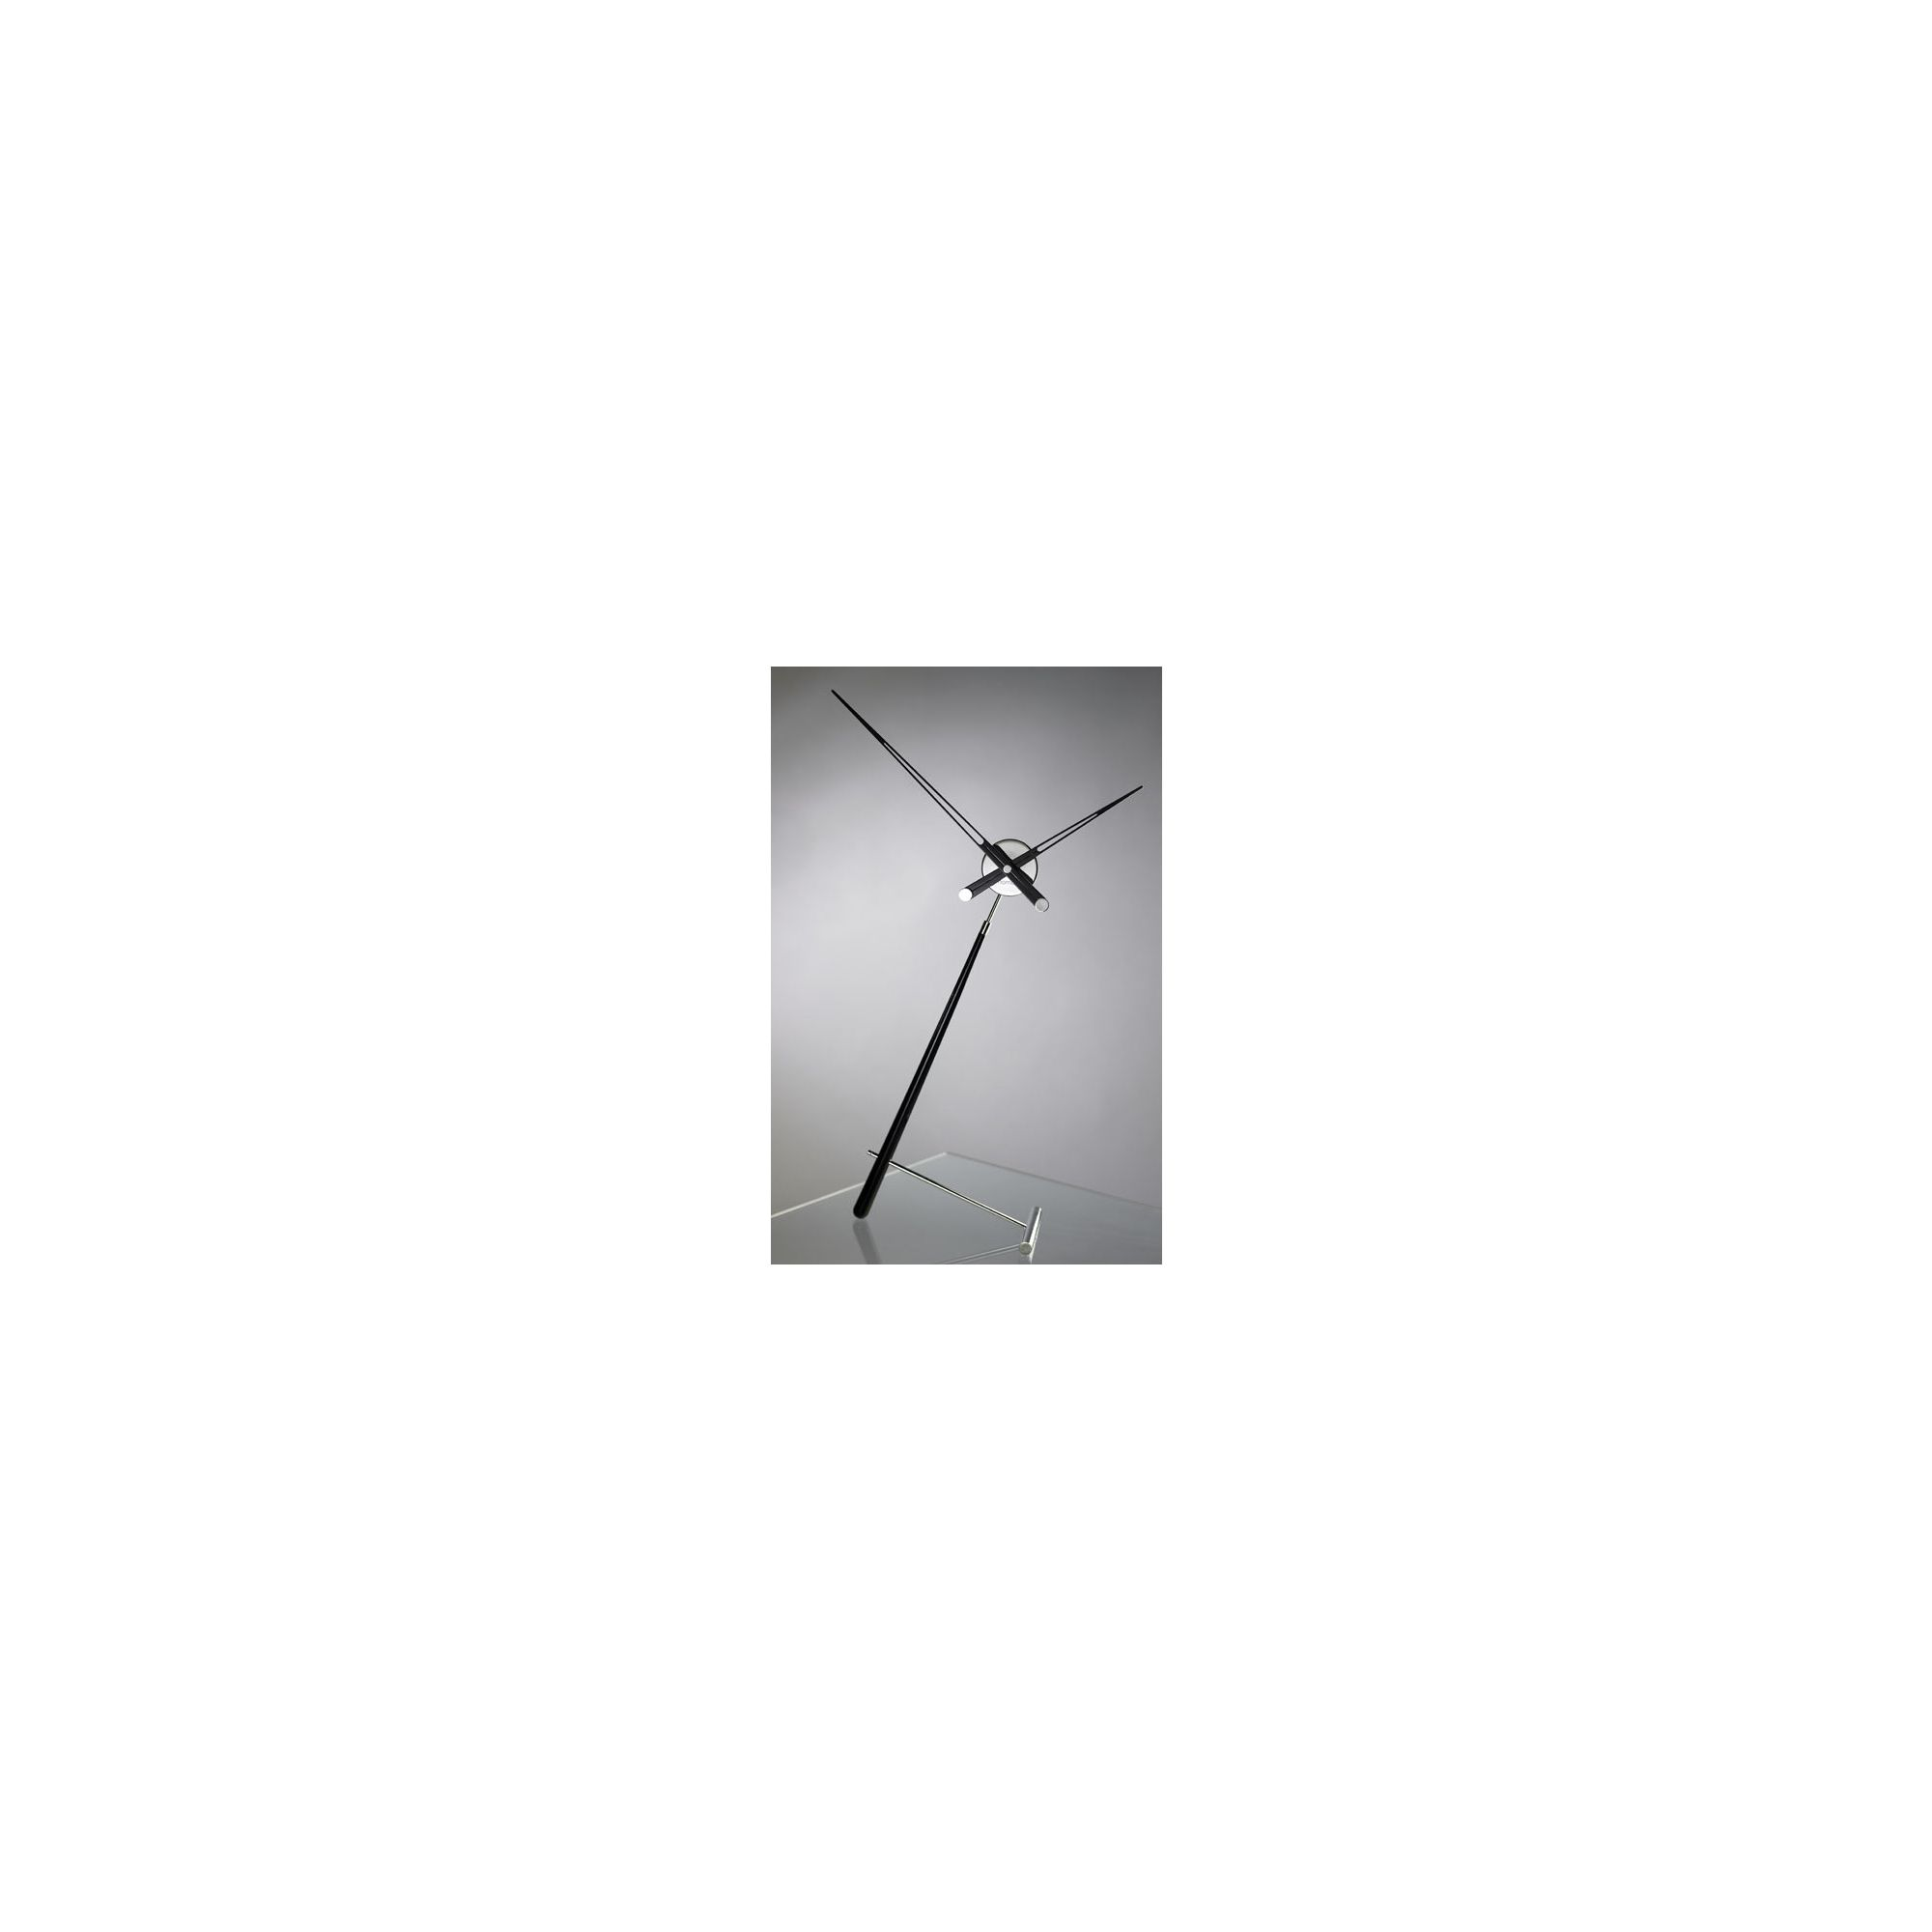 NOMON Puntero L Clock - Black Lacquered at Tesco Direct